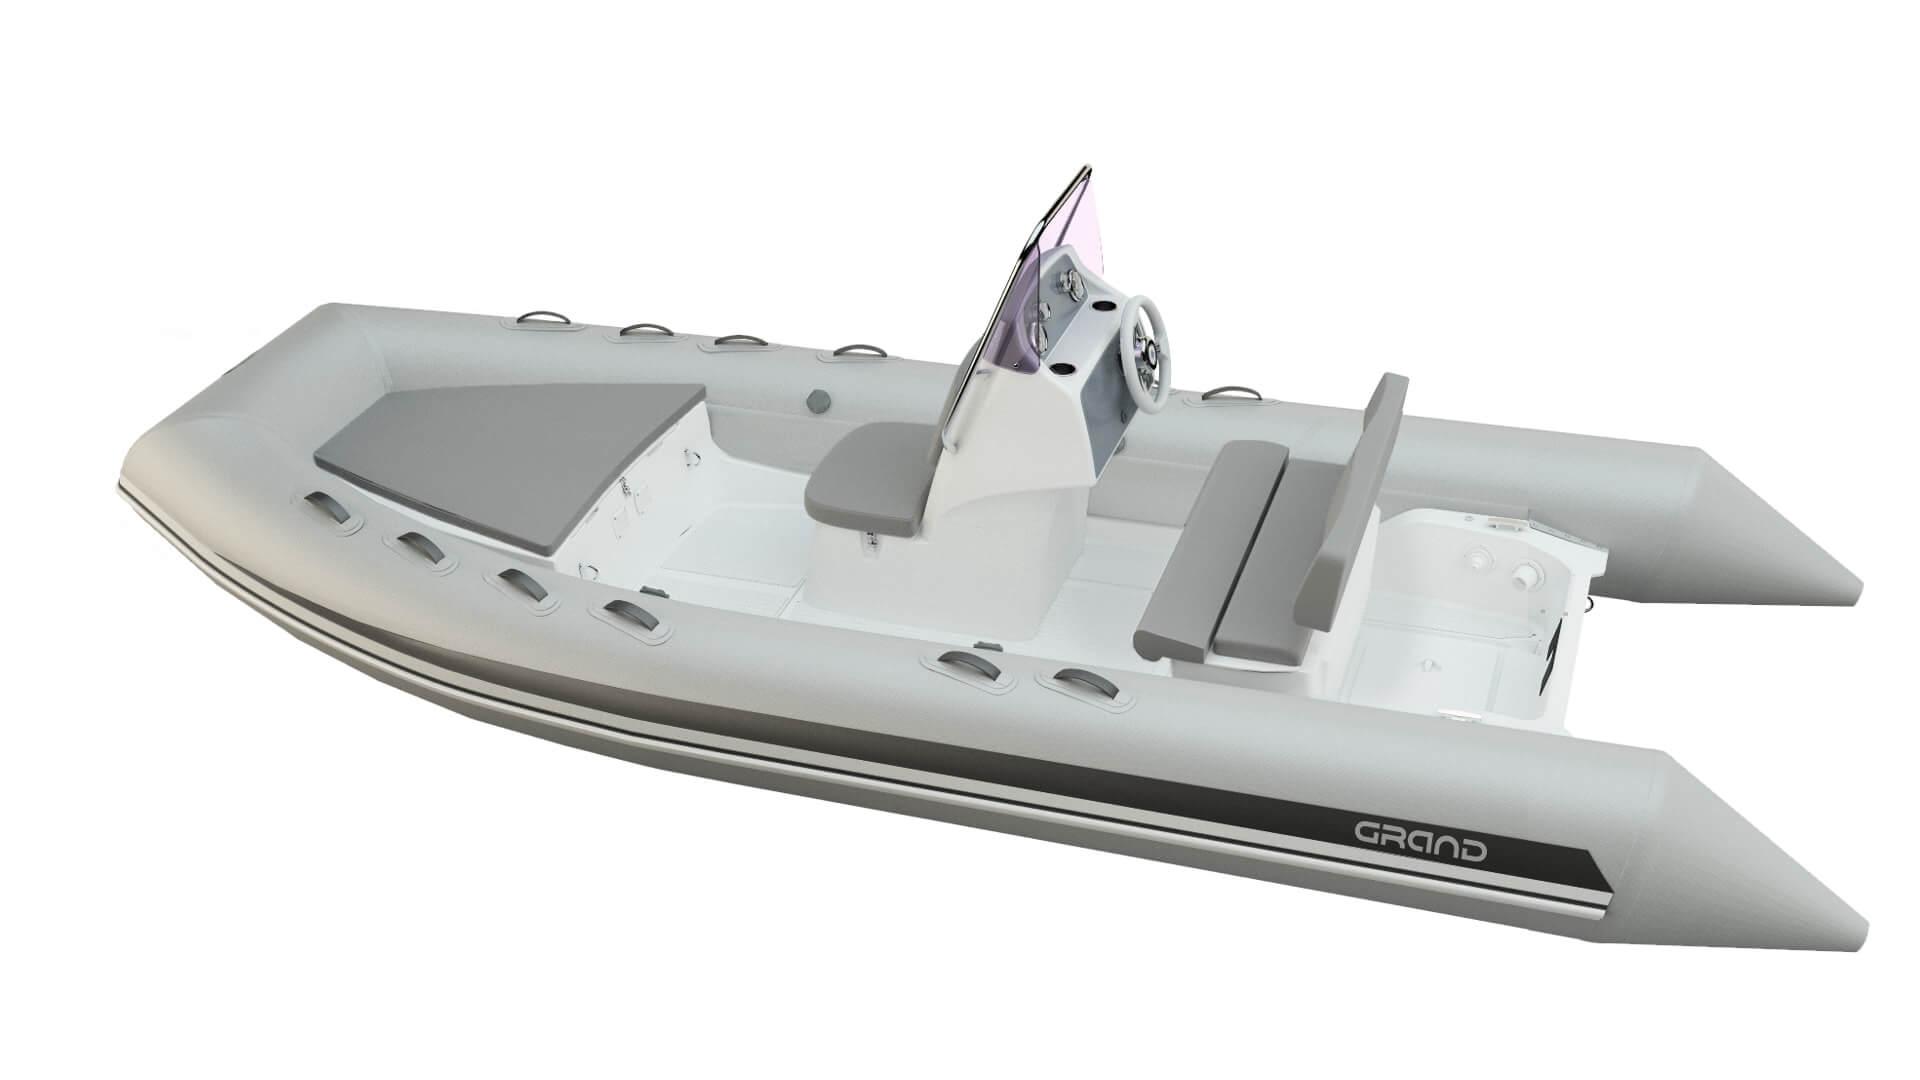 Надувная лодка с жестким дном GRAND Silver Line S520L, Надувная лодка GRAND Silver Line S520LF, GRAND Silver Line S520L, GRAND Silver Line S520LF, GRAND S520L, GRAND S520LF, GRAND S520